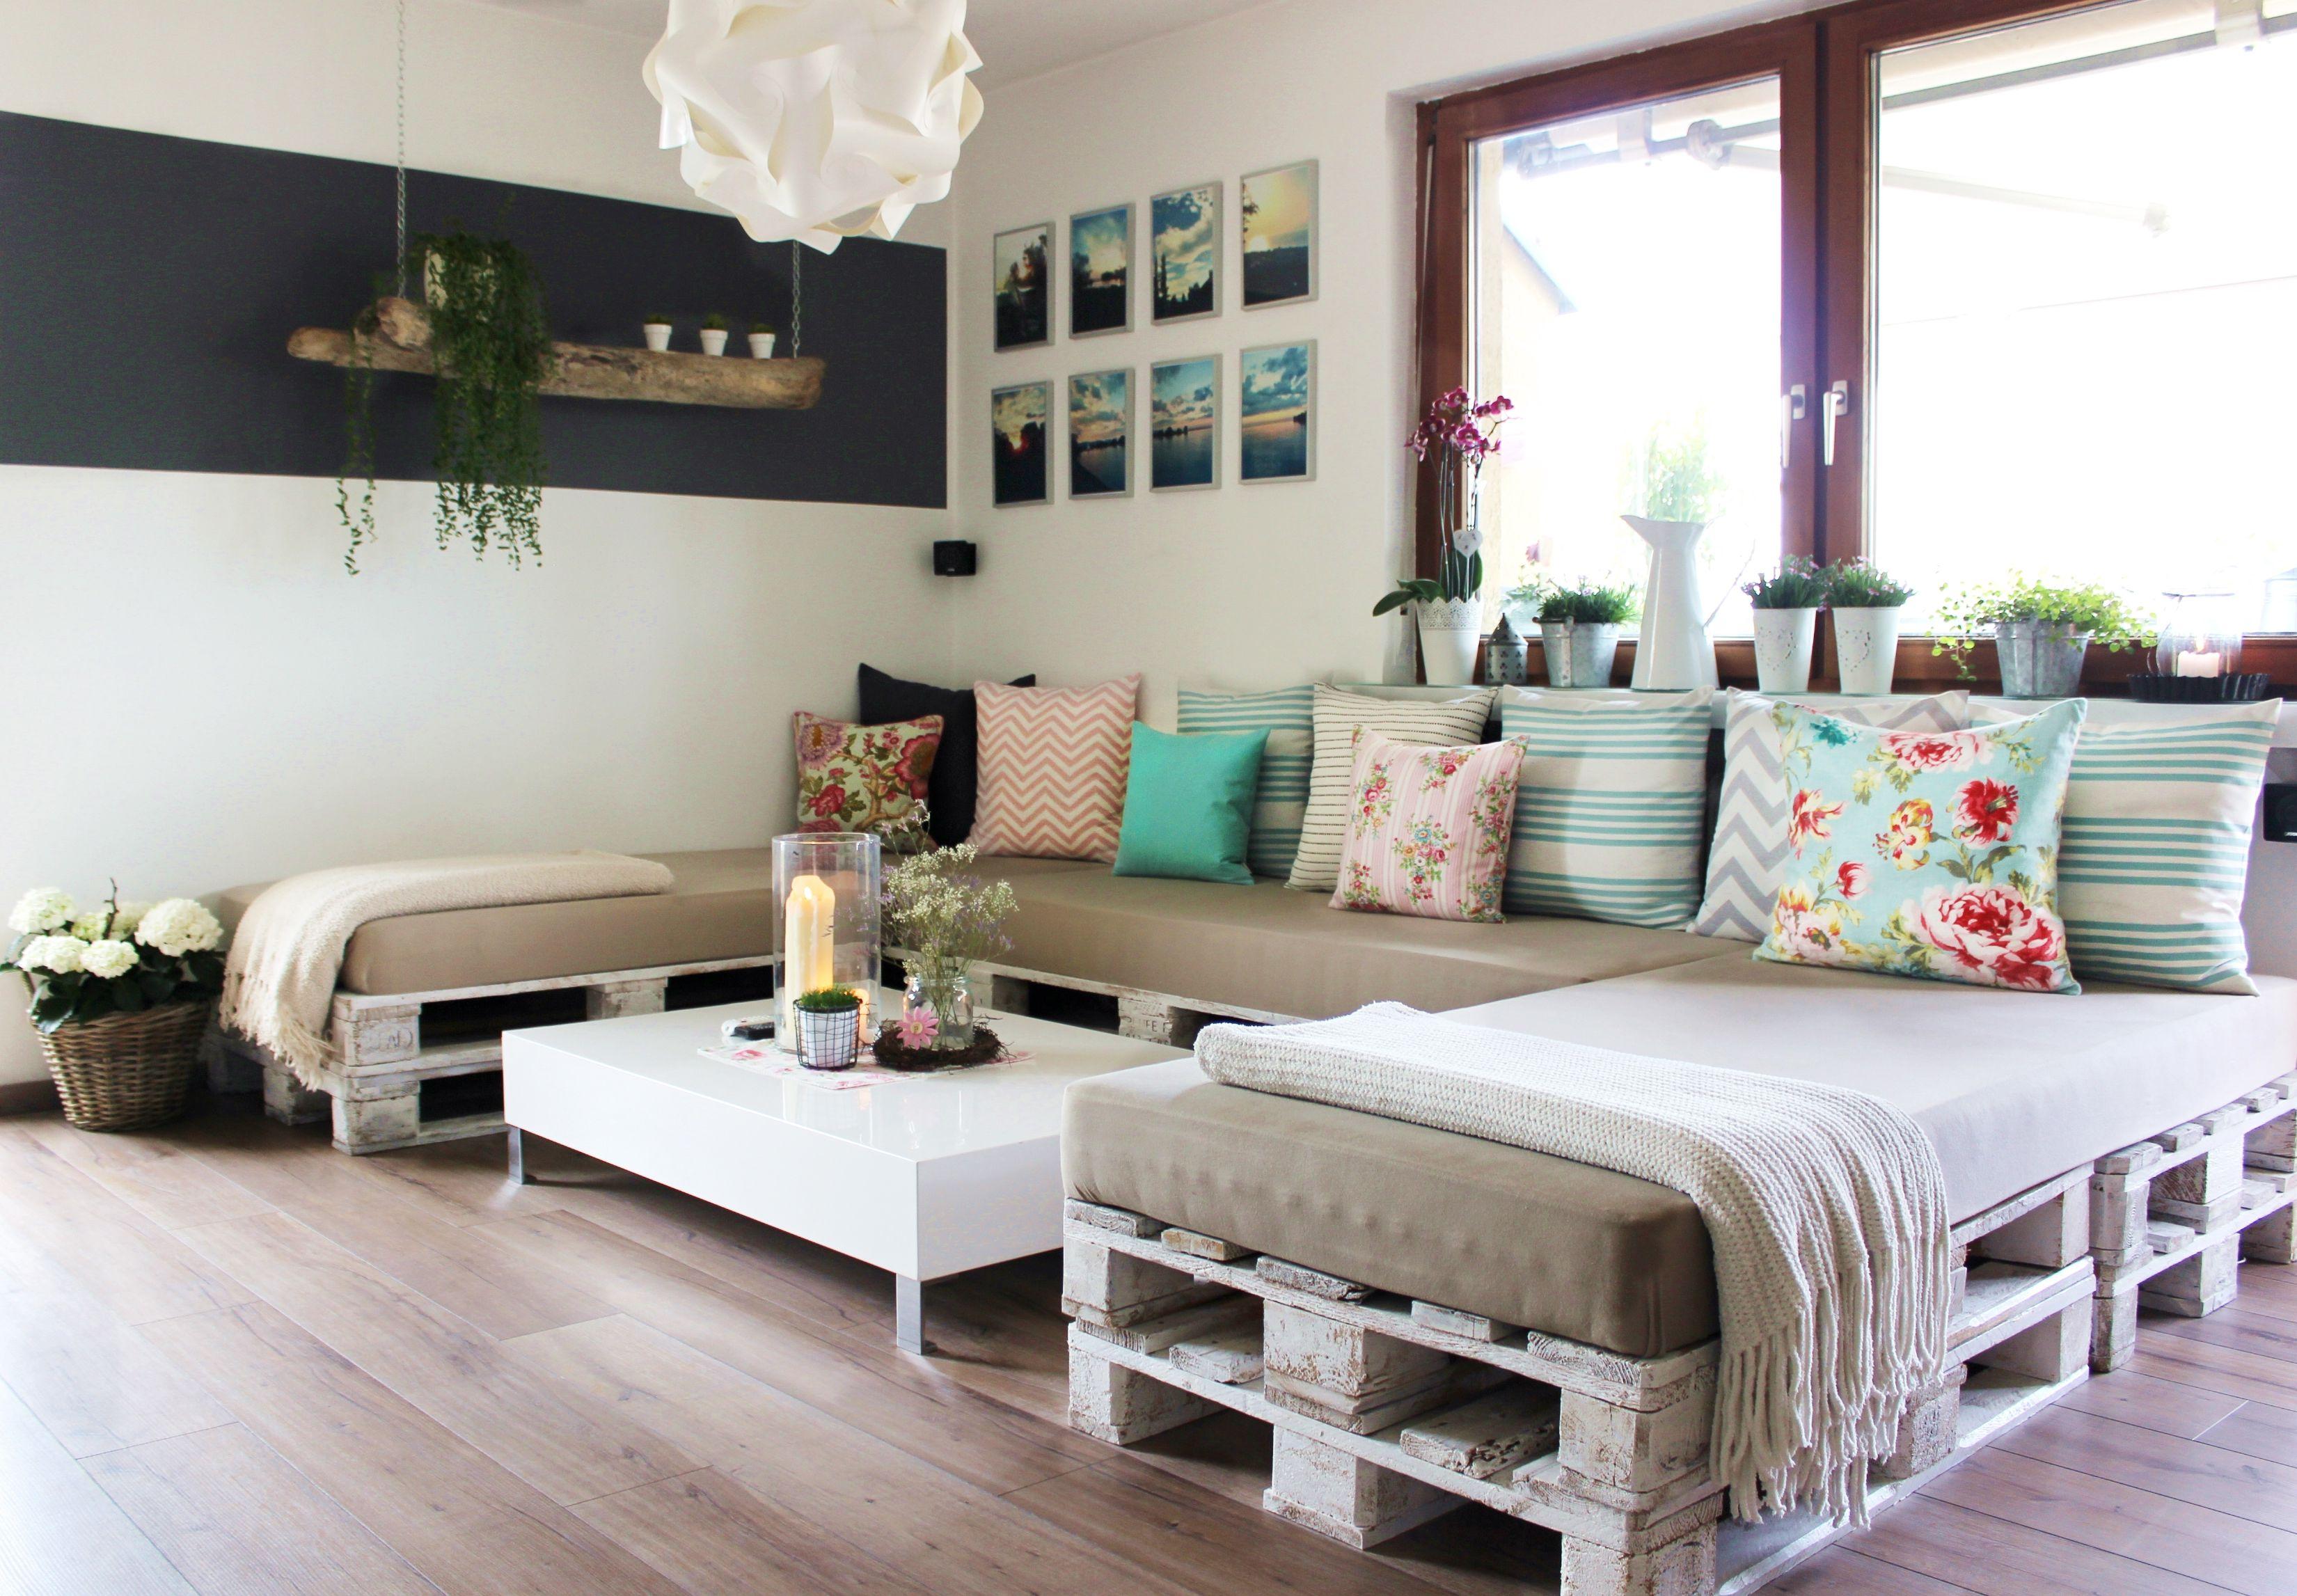 Couch Aus Europaletten Home Sweet Home Pinterest Pallets